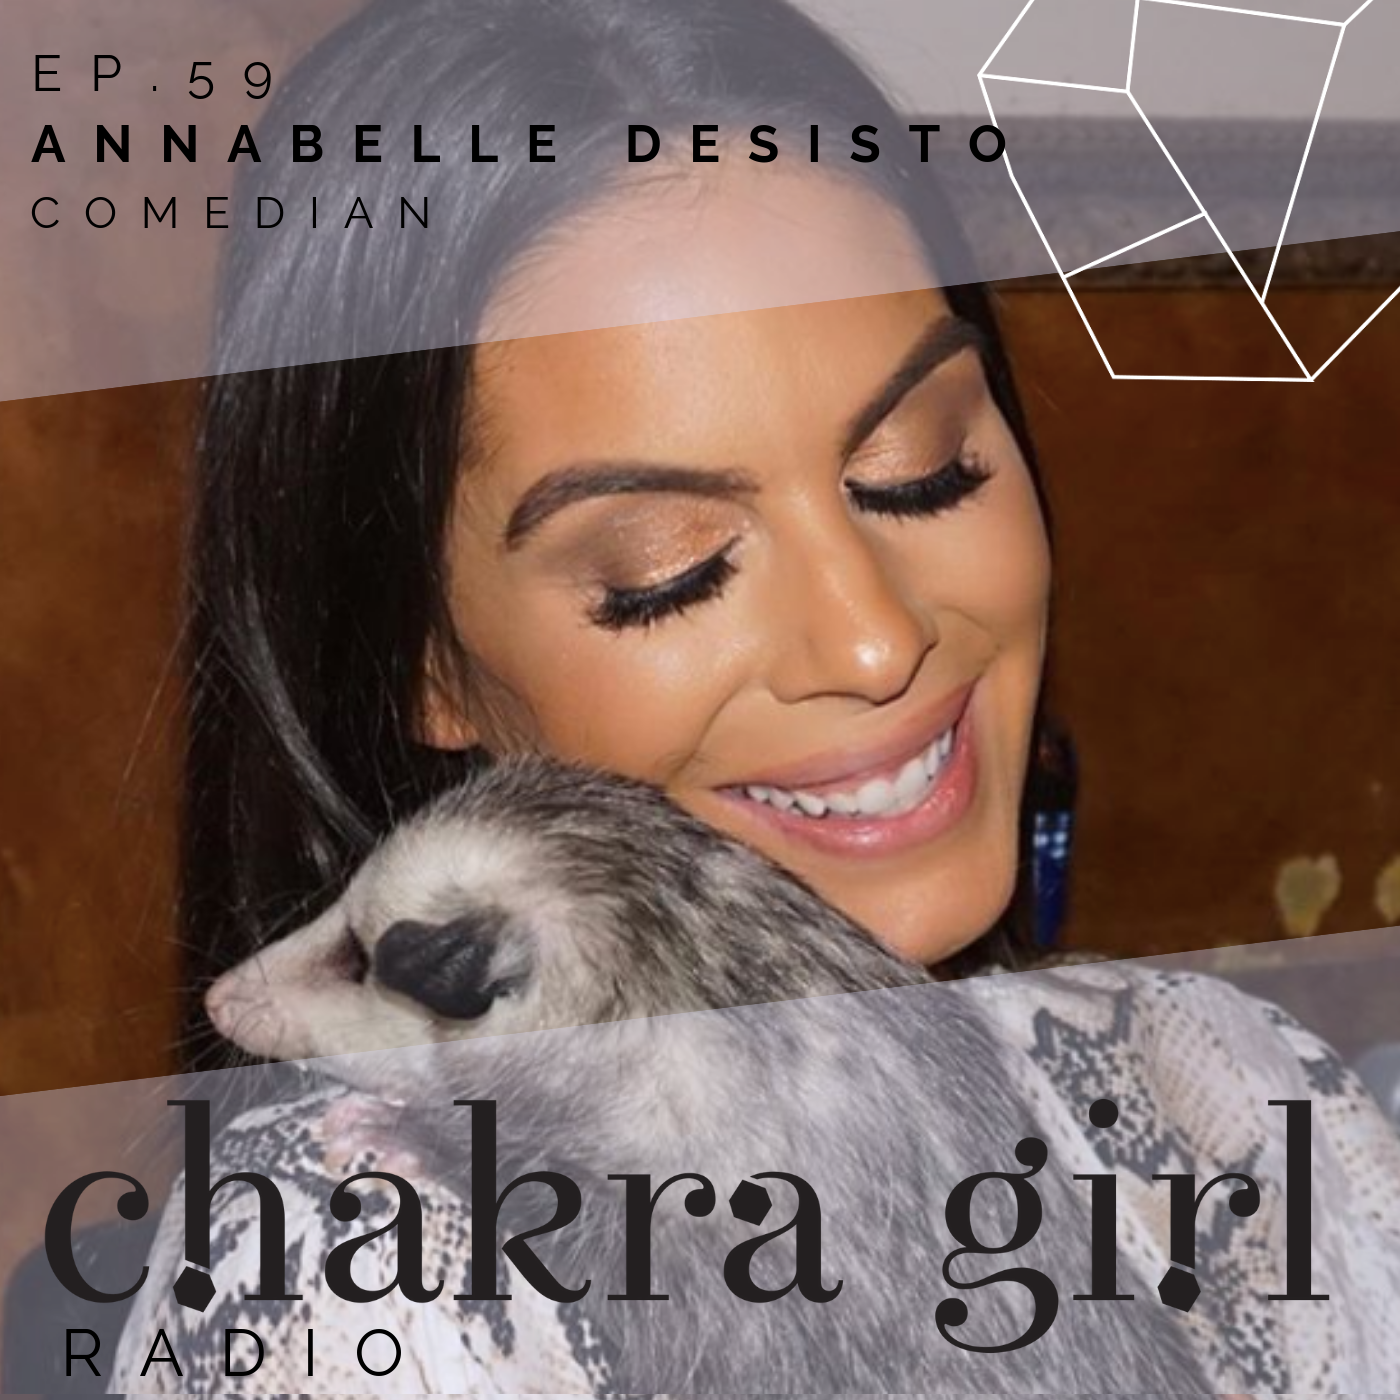 Annabelle DeSisto CHAKRA GIRL RADIO.png